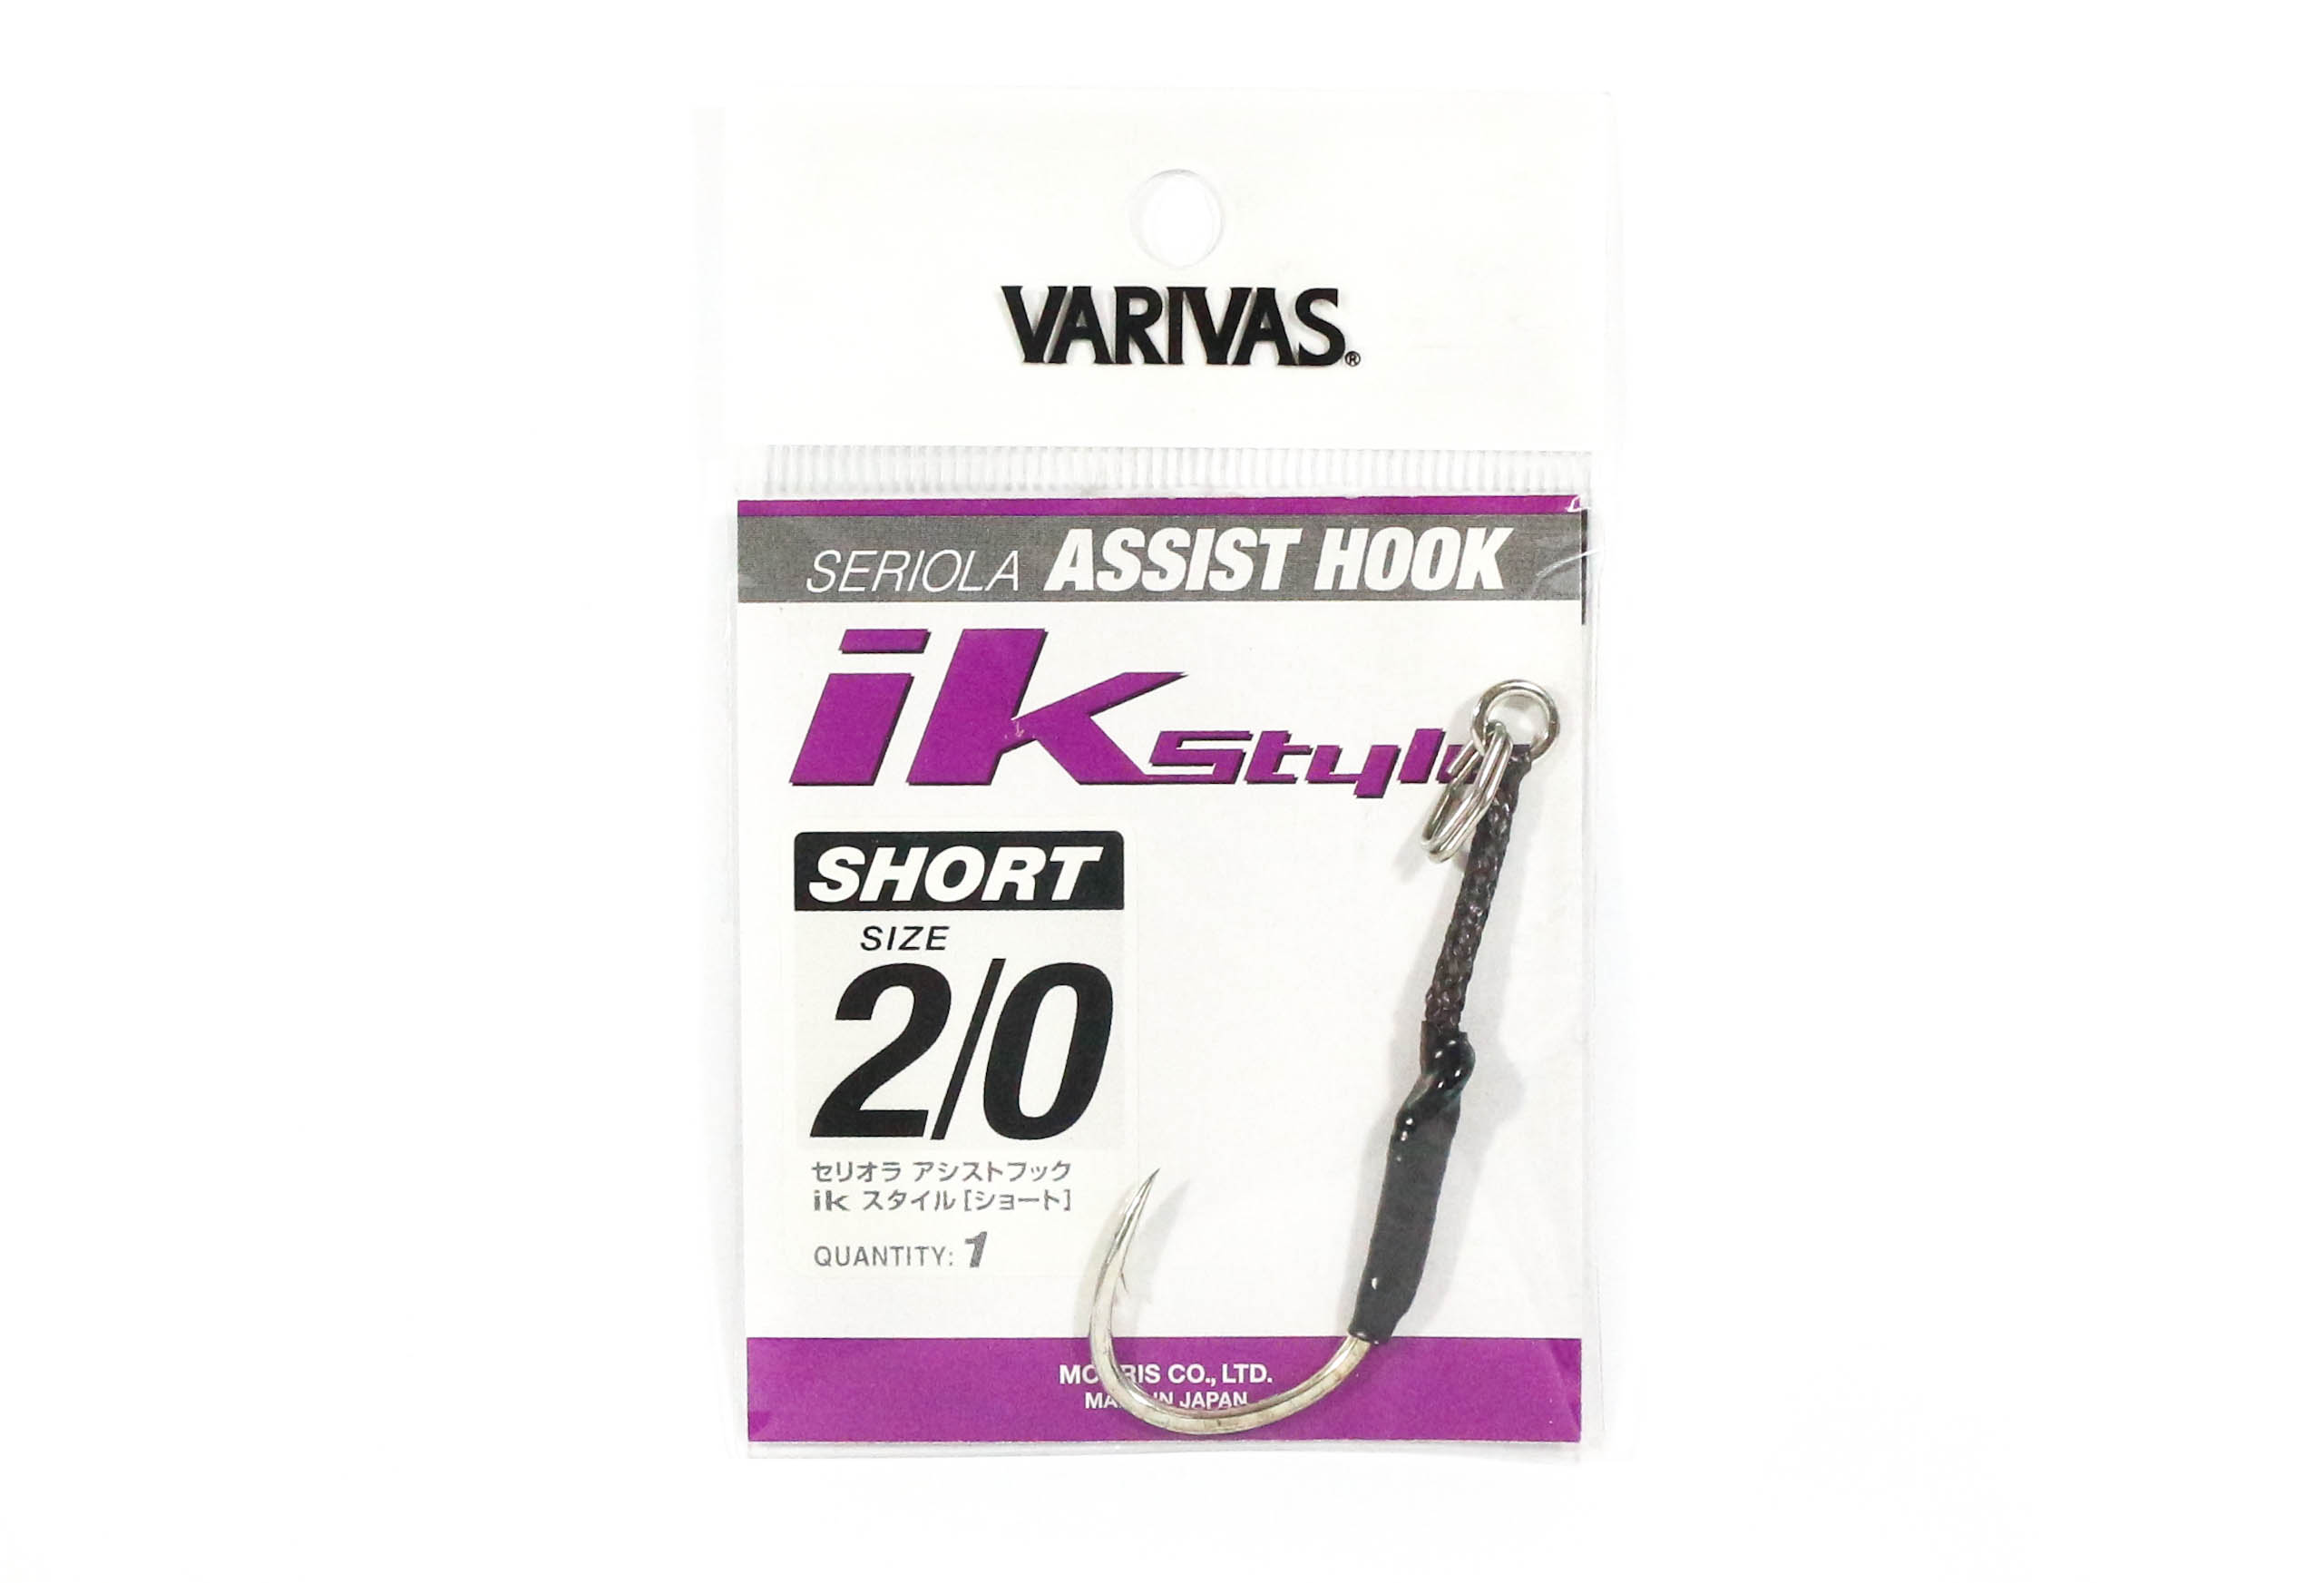 Sale Varivas IK Style Short Seriola Rigged Assist Hooks Size 2/0 (2476)